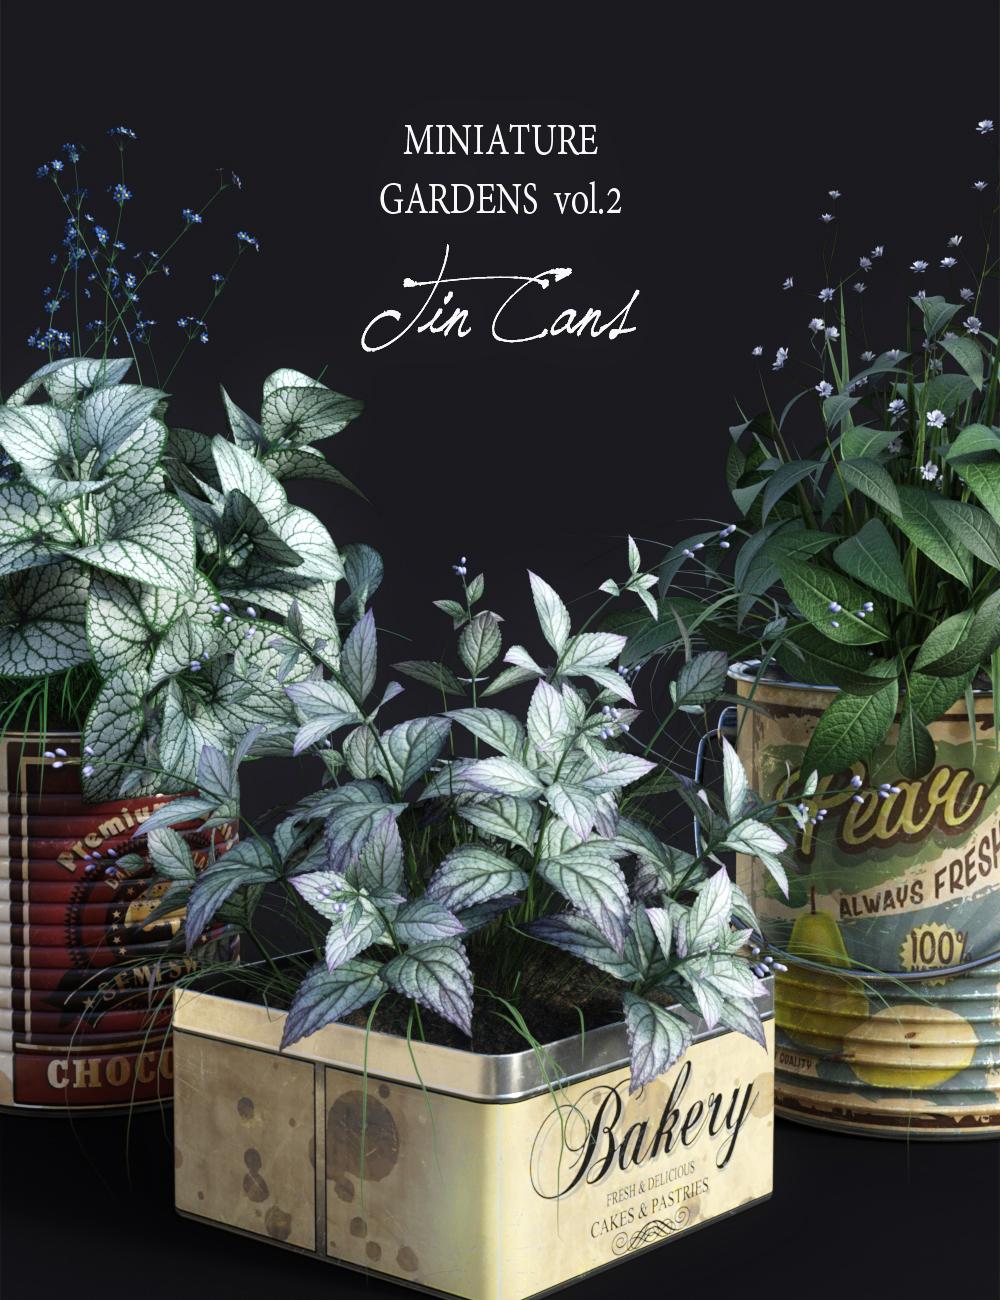 Dgv Miniature Gardens Vol 2 Tincans 3d Models And 3d Software By Daz 3d